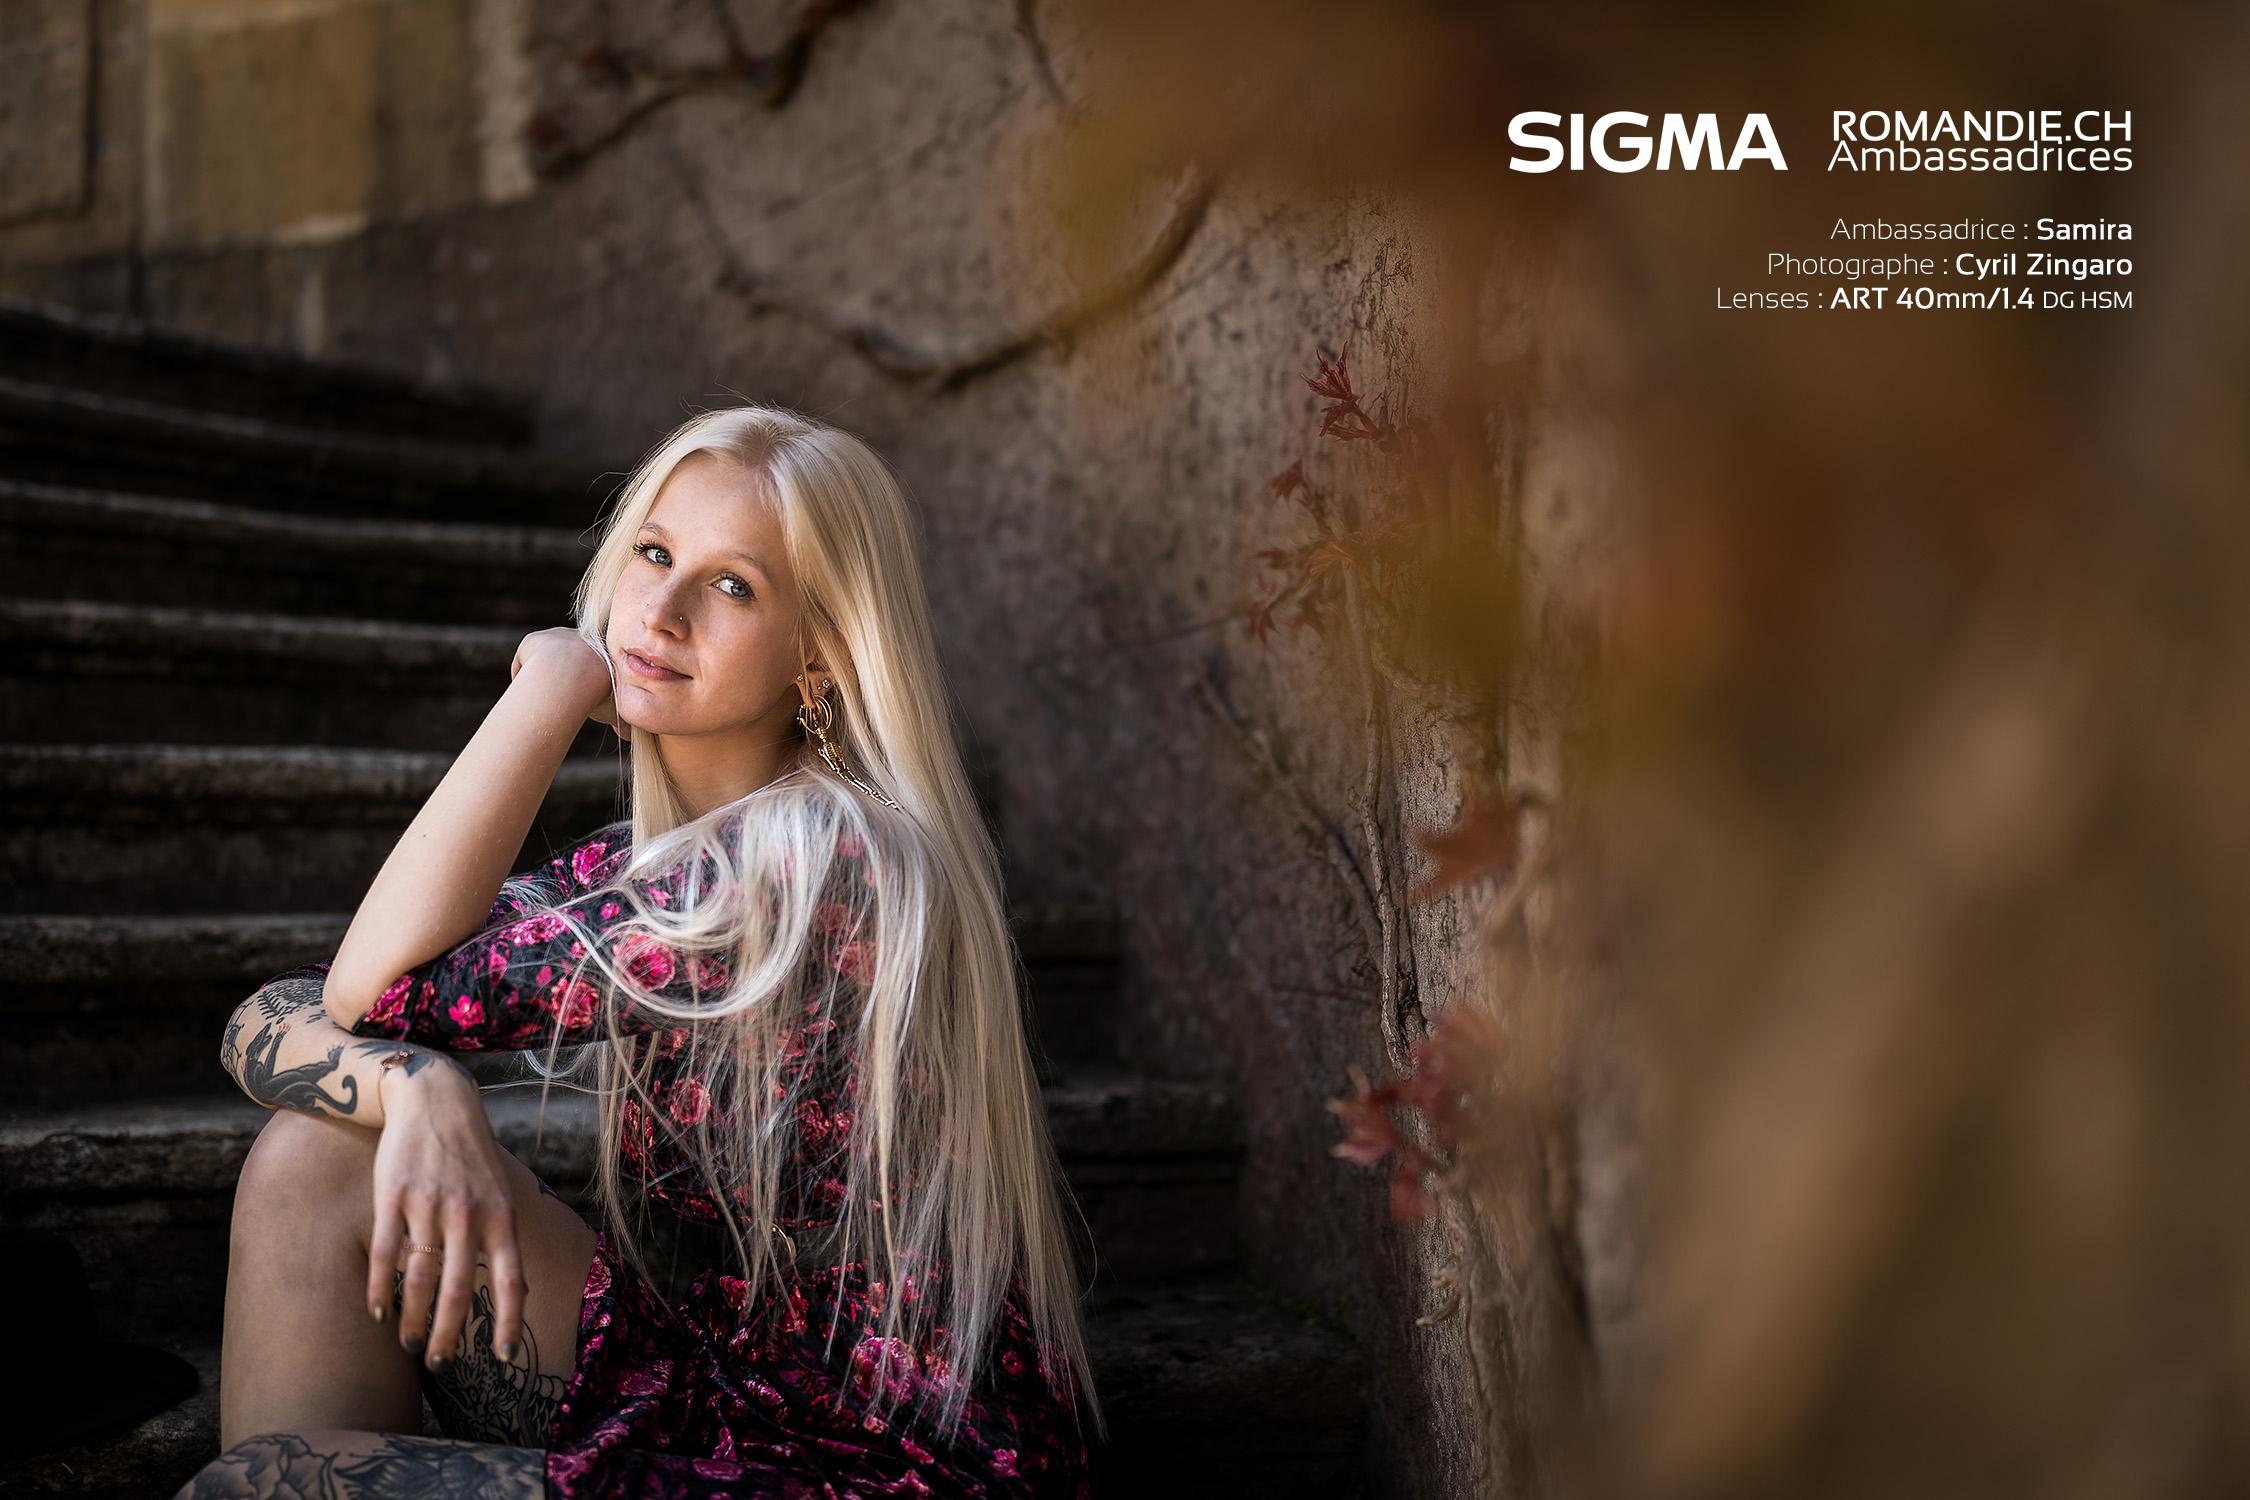 sigma_ambassadrice_2019_27HD